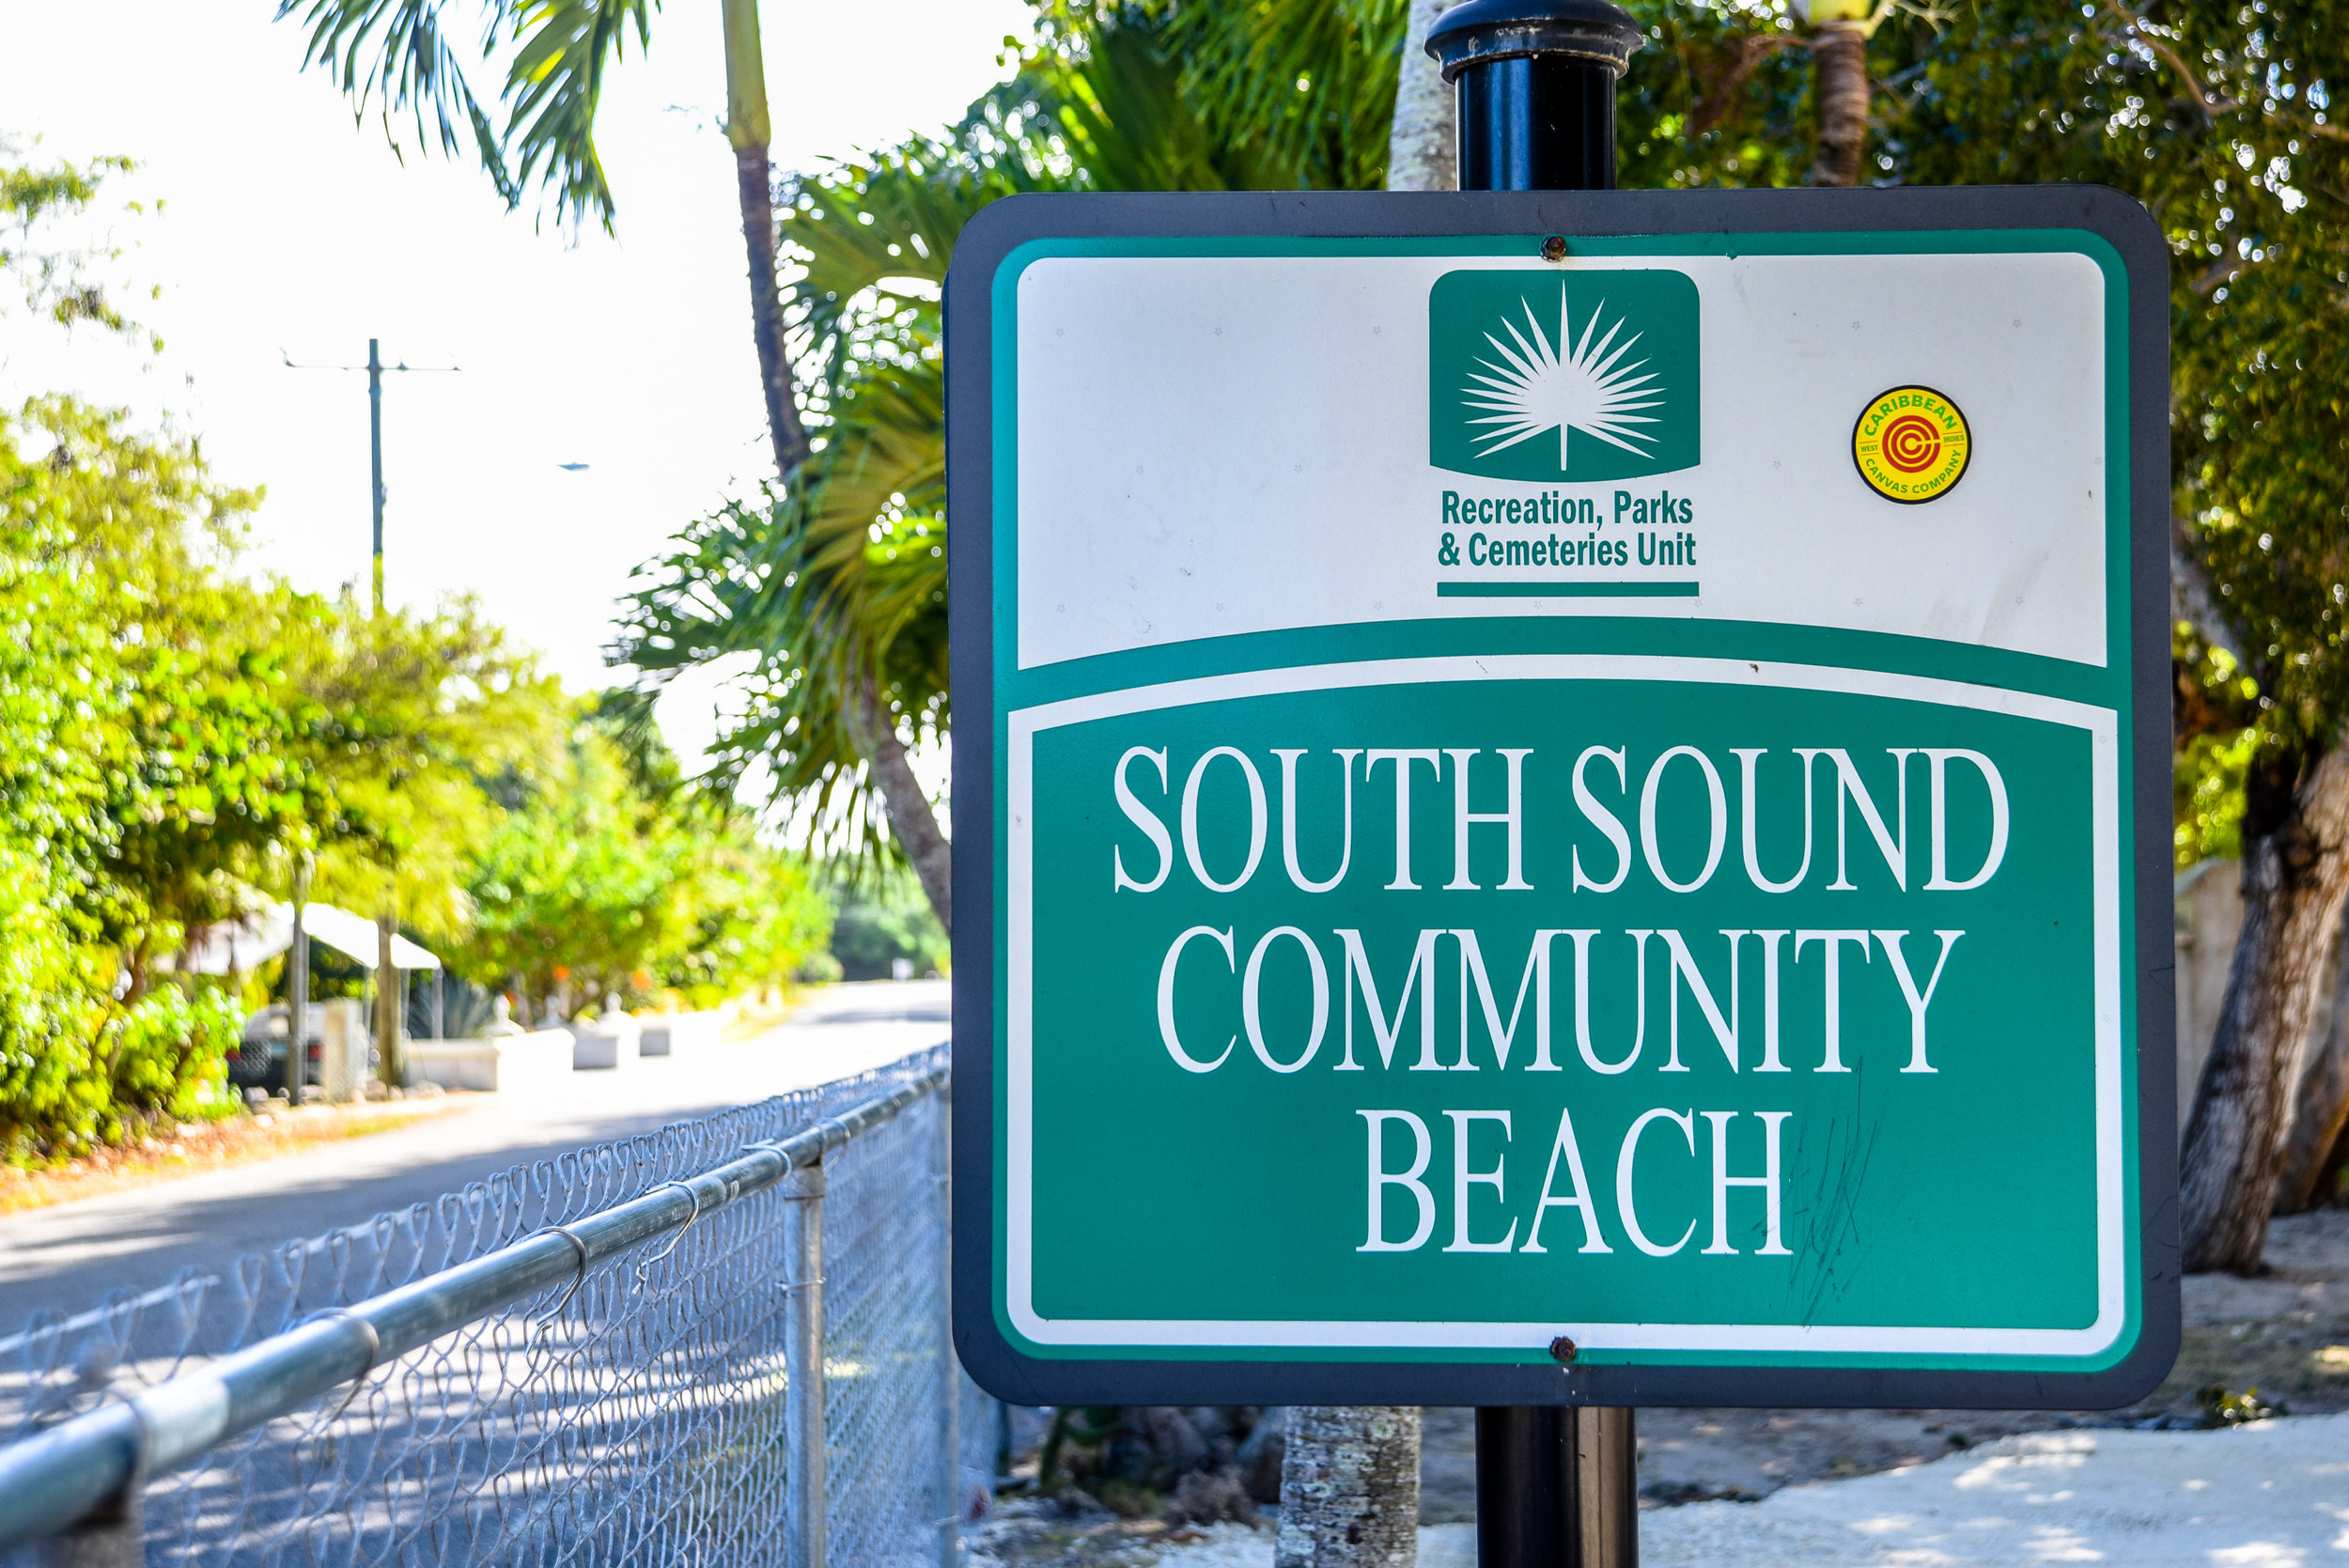 South Sound Community Beach